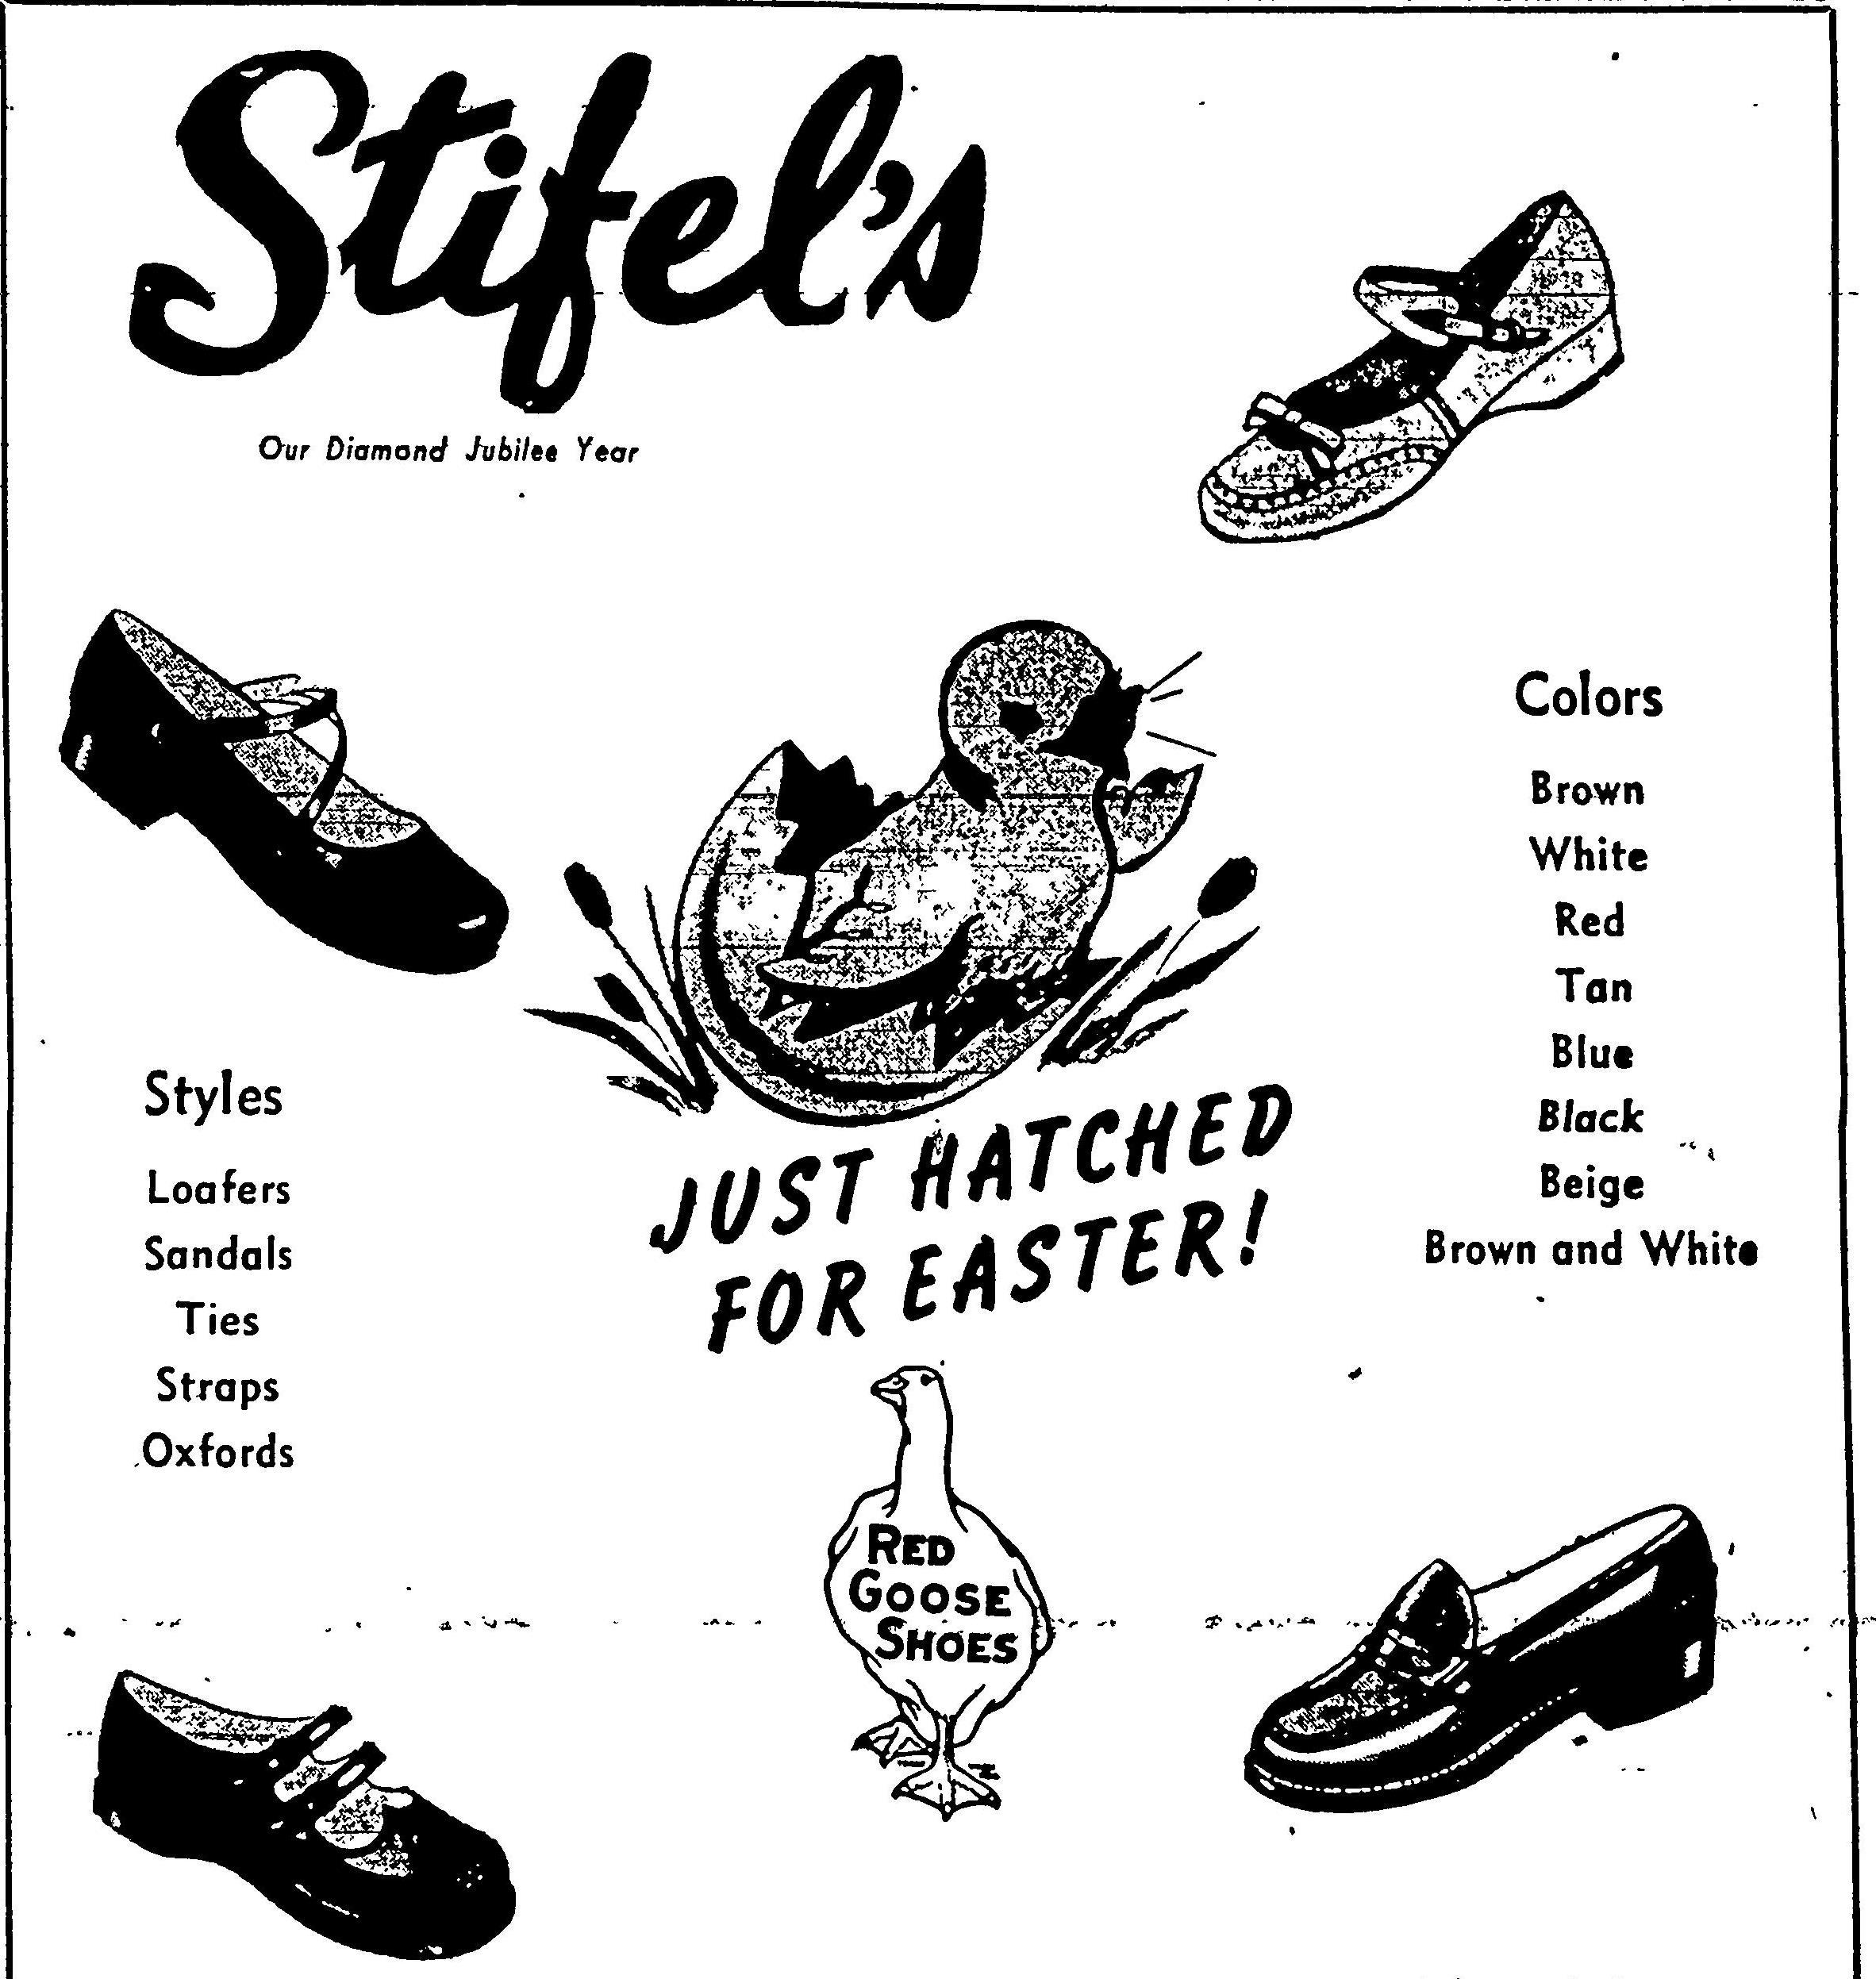 Stifel's - Wheeling Intelligencer, March 19, 1953